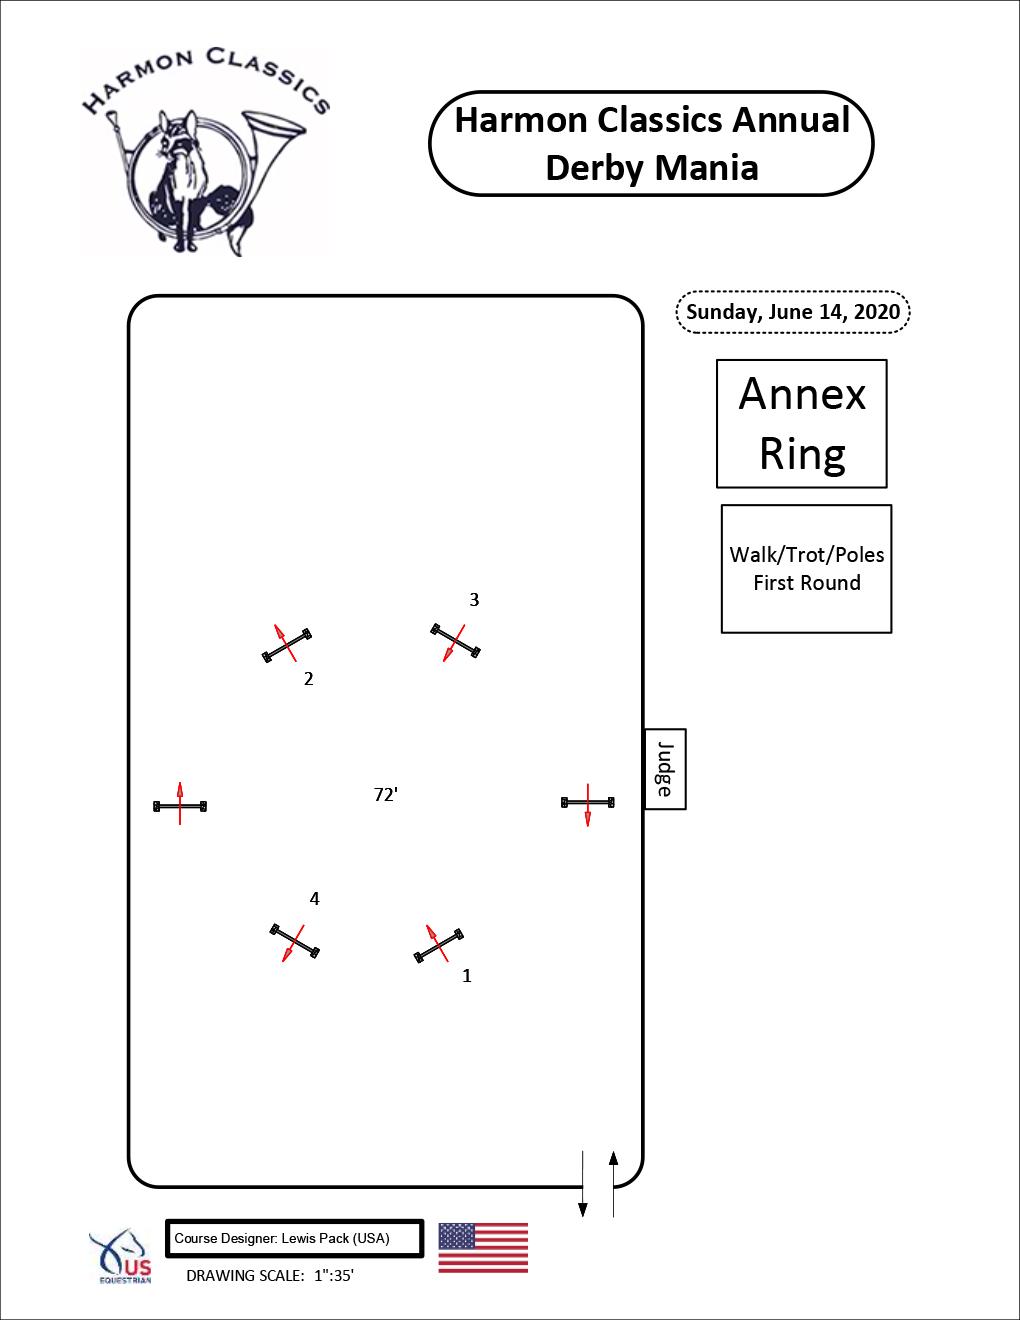 Annex-Ring-Sunday6-14-Walk-Trot-Poles-First-Round-Harmon-Classics-Derby-Mania